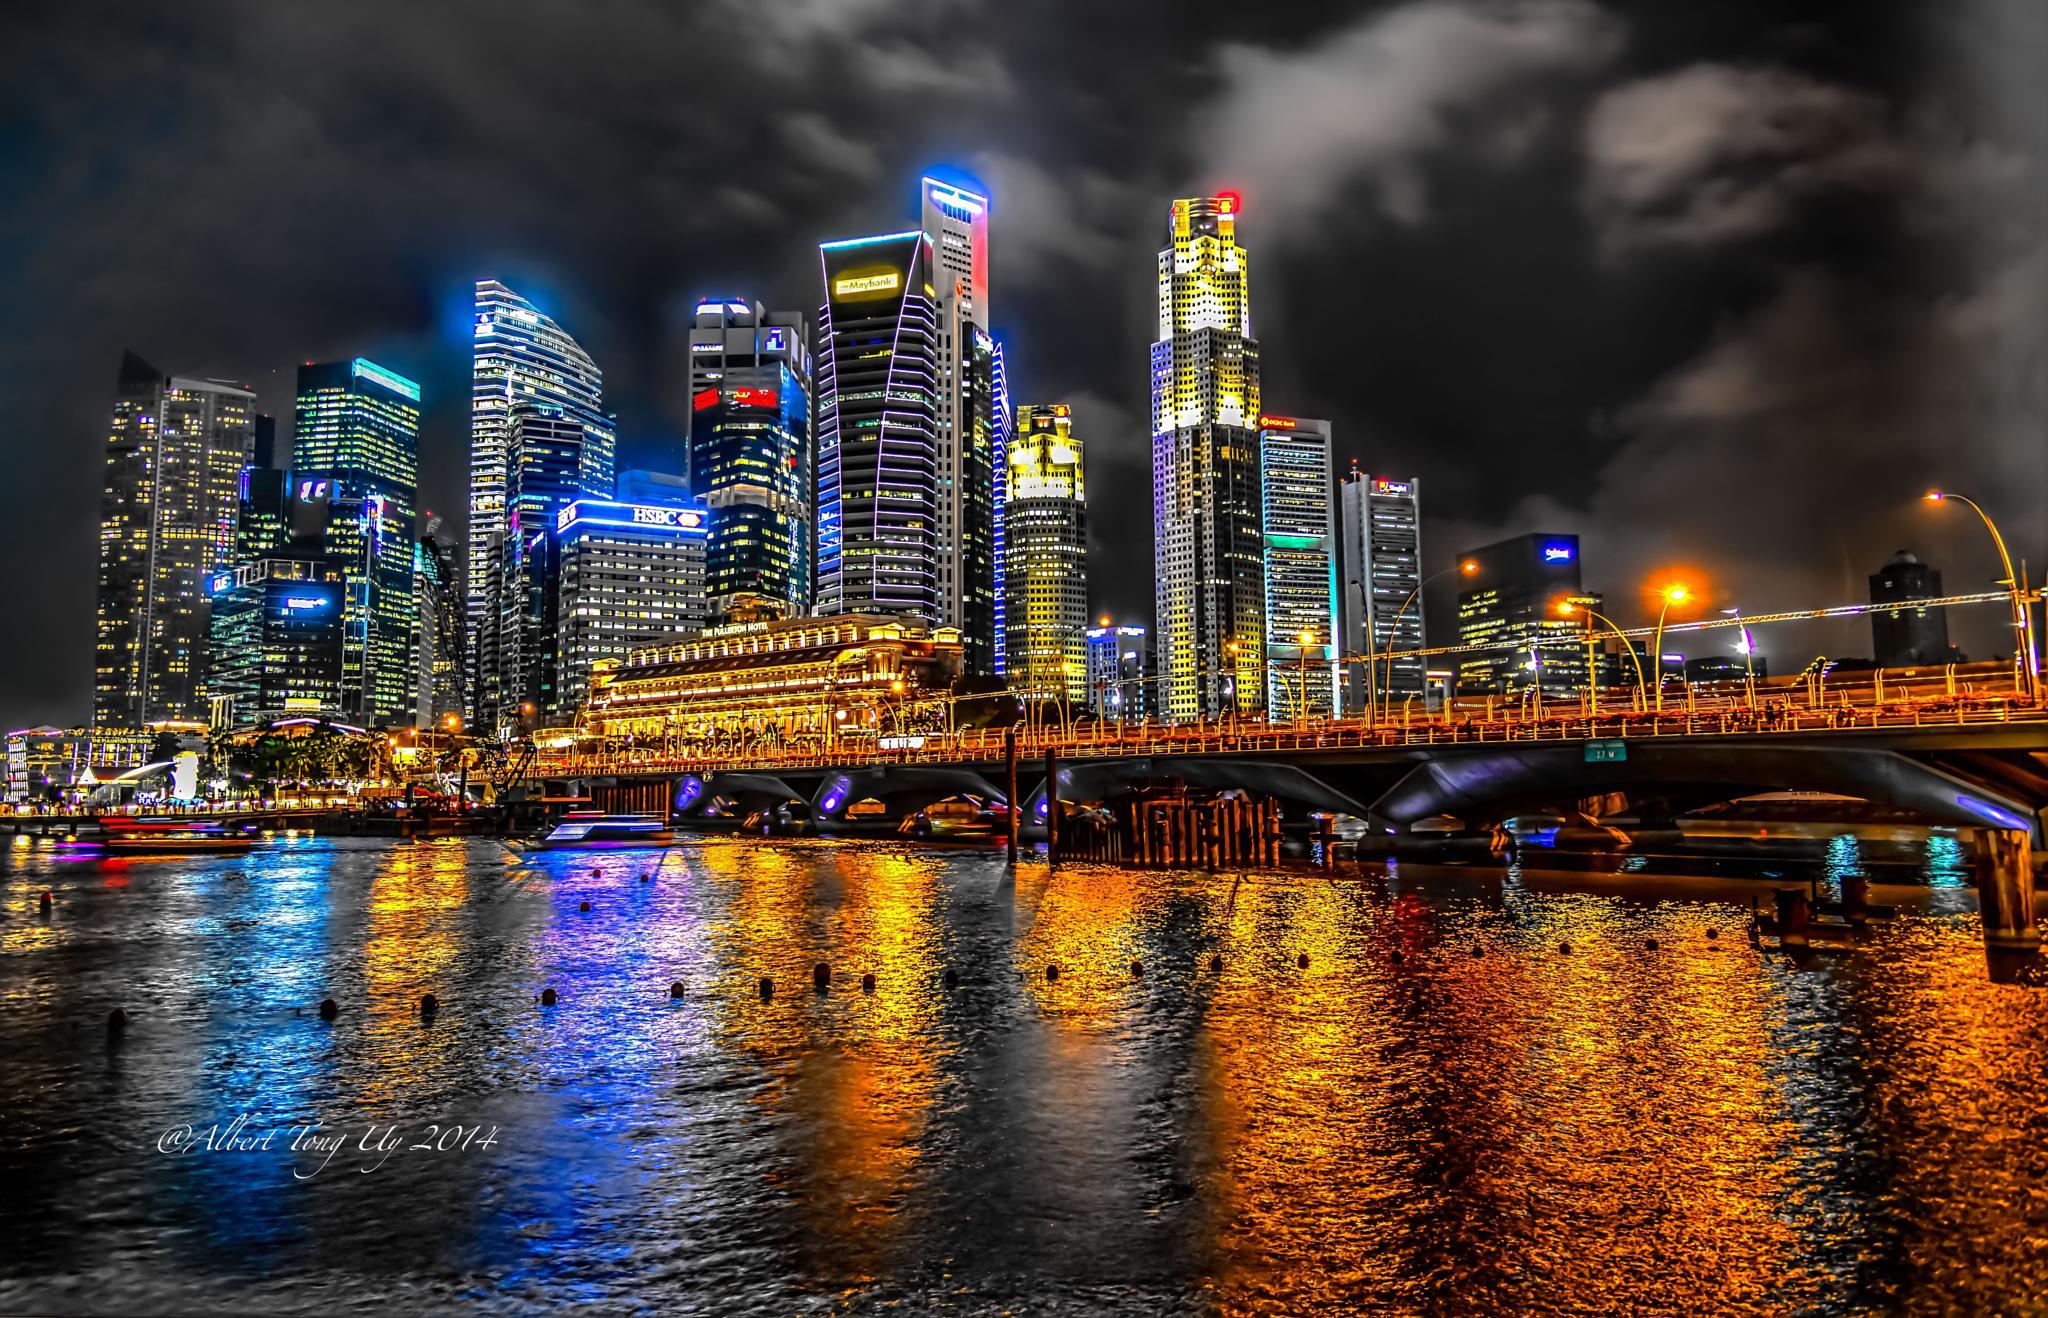 Structures Around Marina Bay Sands at Night, Singapore, photo 33 by iatu8888